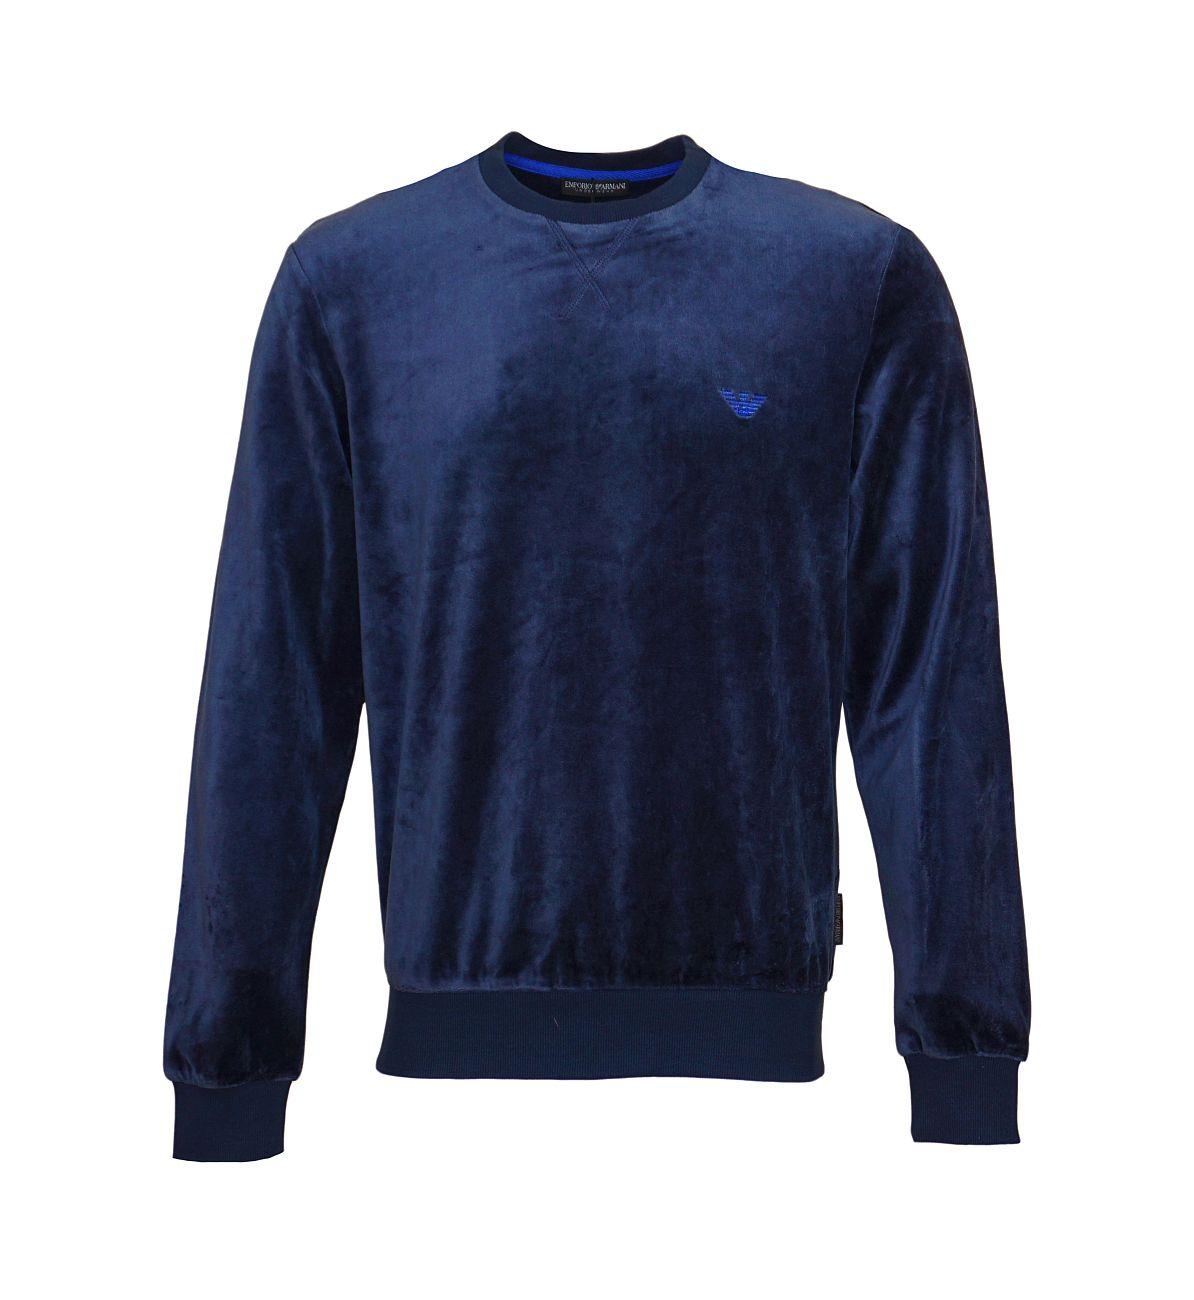 Emporio Armani Sweater Pullover Rundhals 111785 8A589 00135 MARINE WX18-EAS